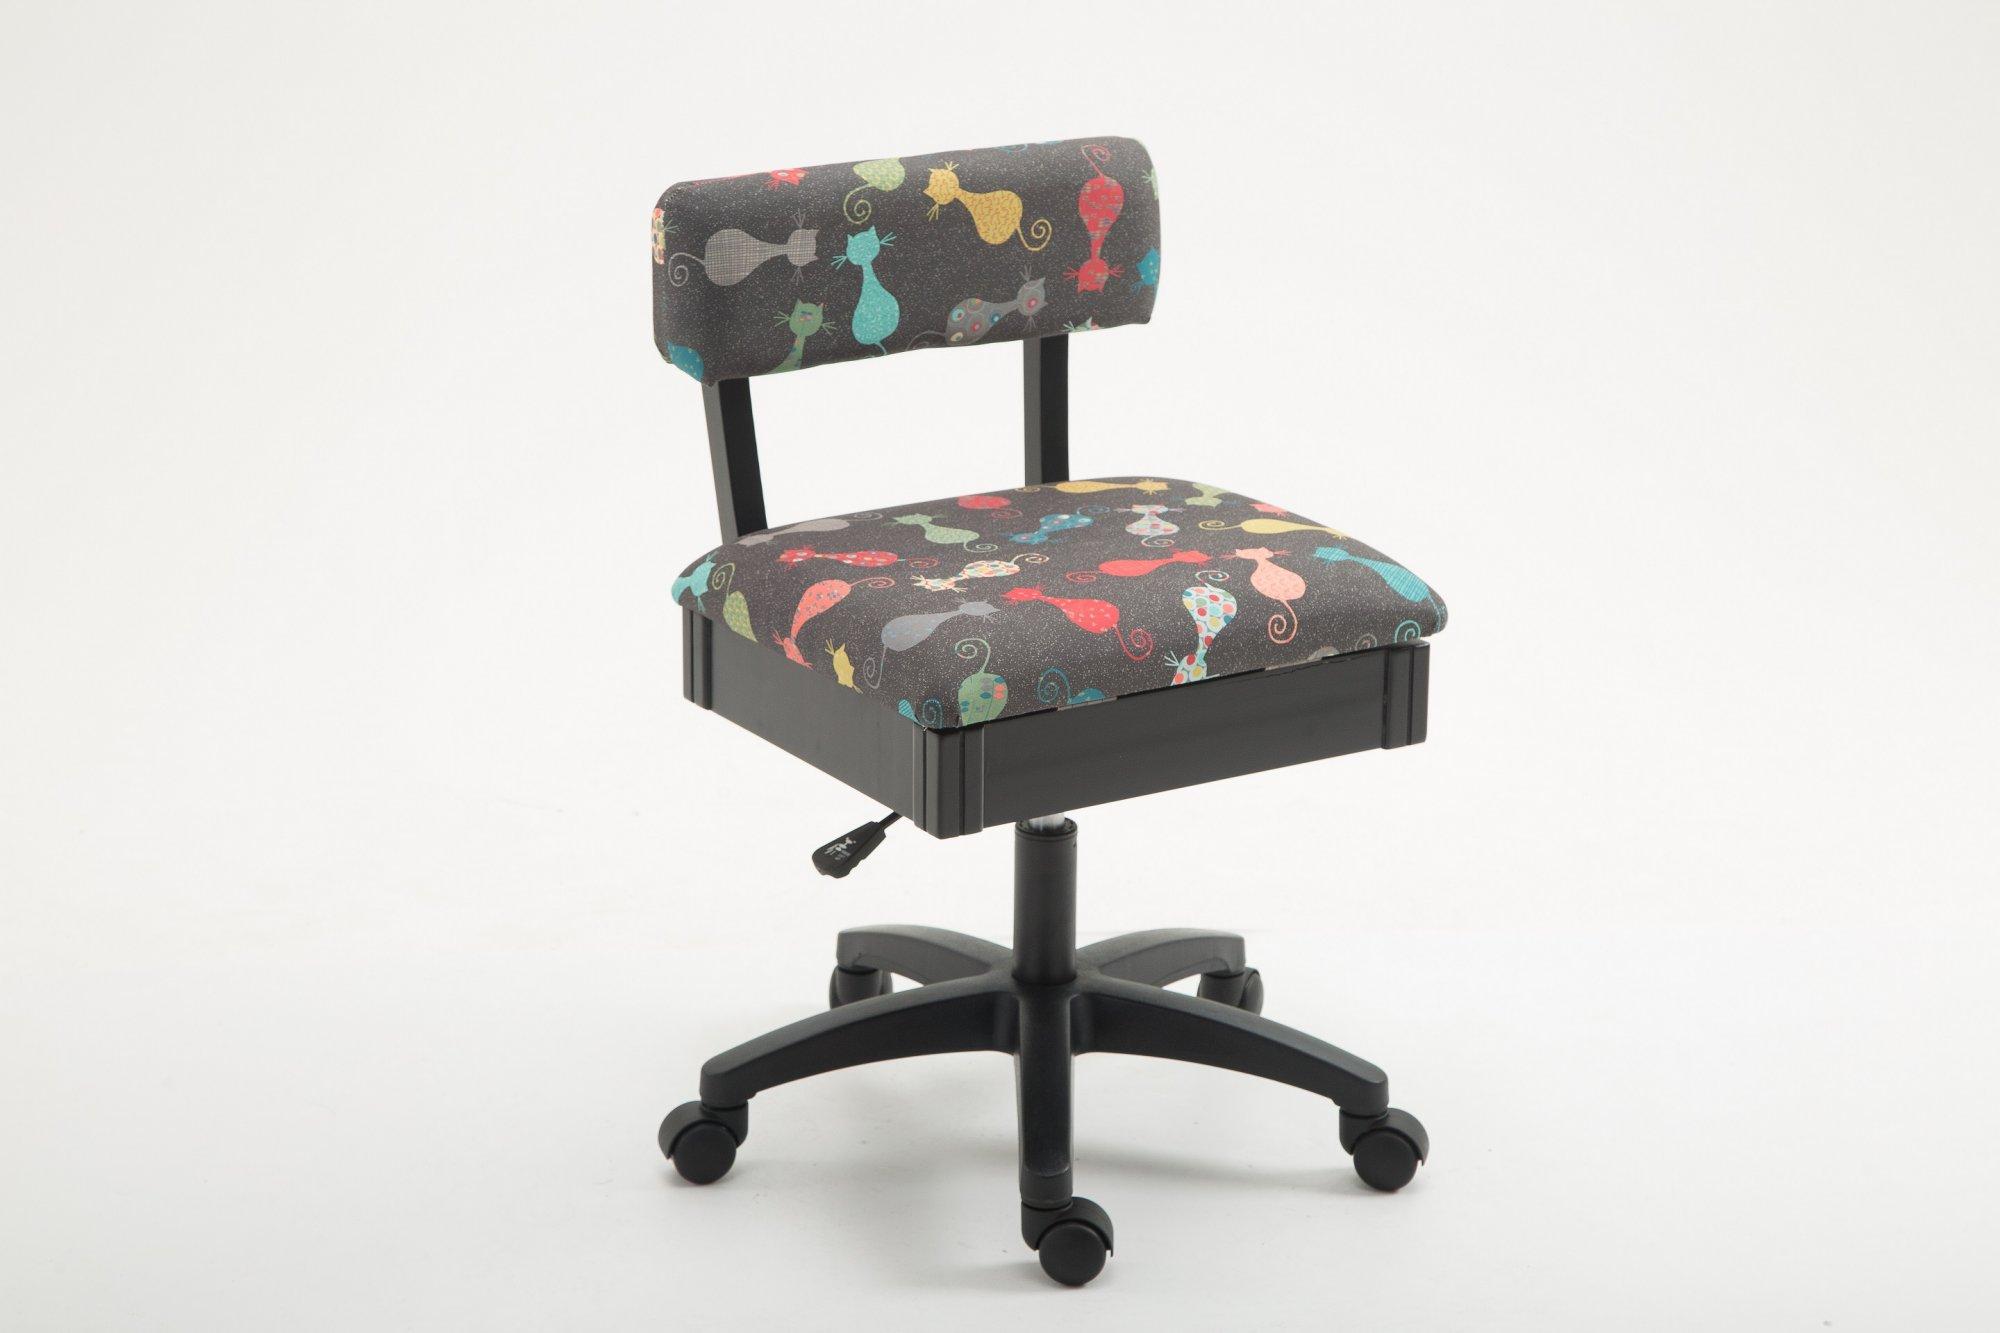 Arrow H6103 Hydraulic Chair - Cat's Meow